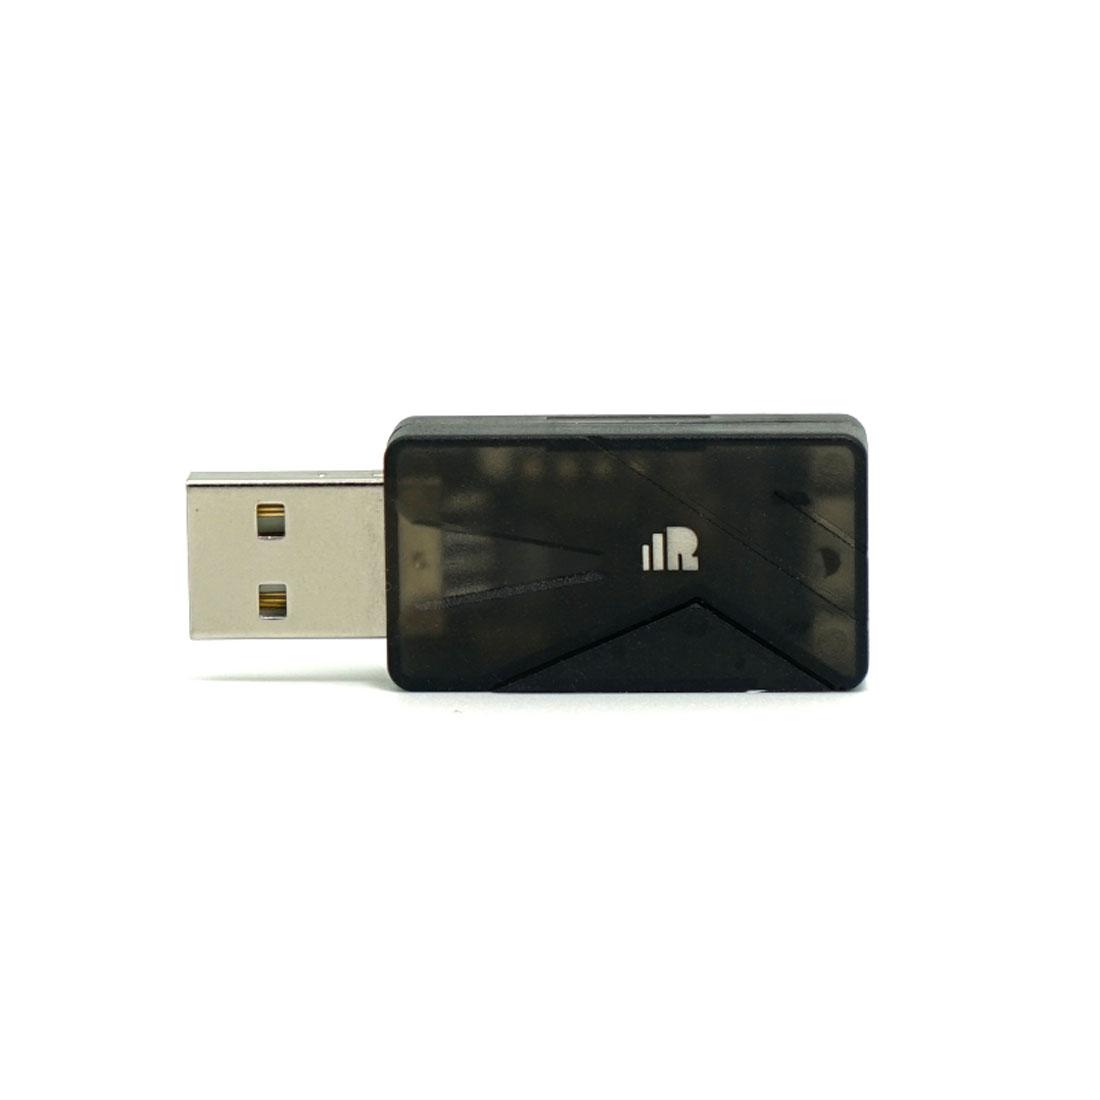 FrSky XSR-SIM Wireless USB Simulator USB Dongle Compatible